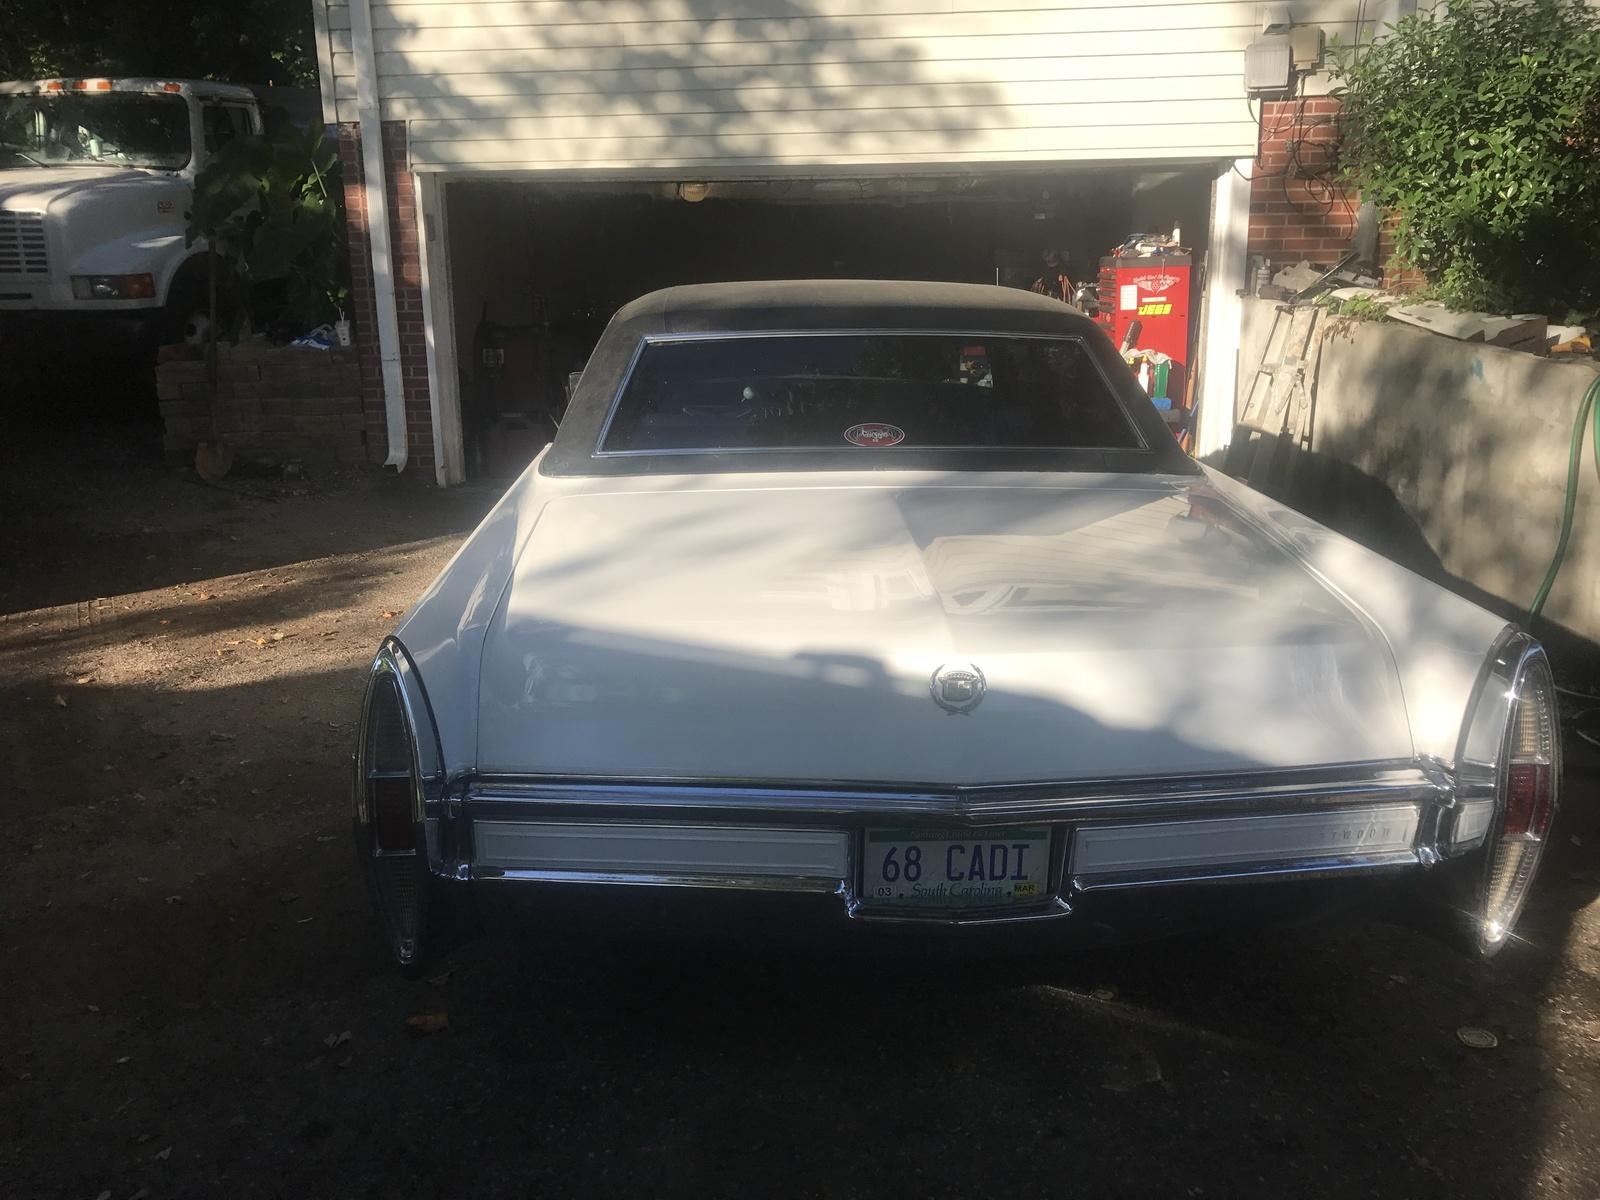 1968 Cadillac Fleetwood Overview CarGurus